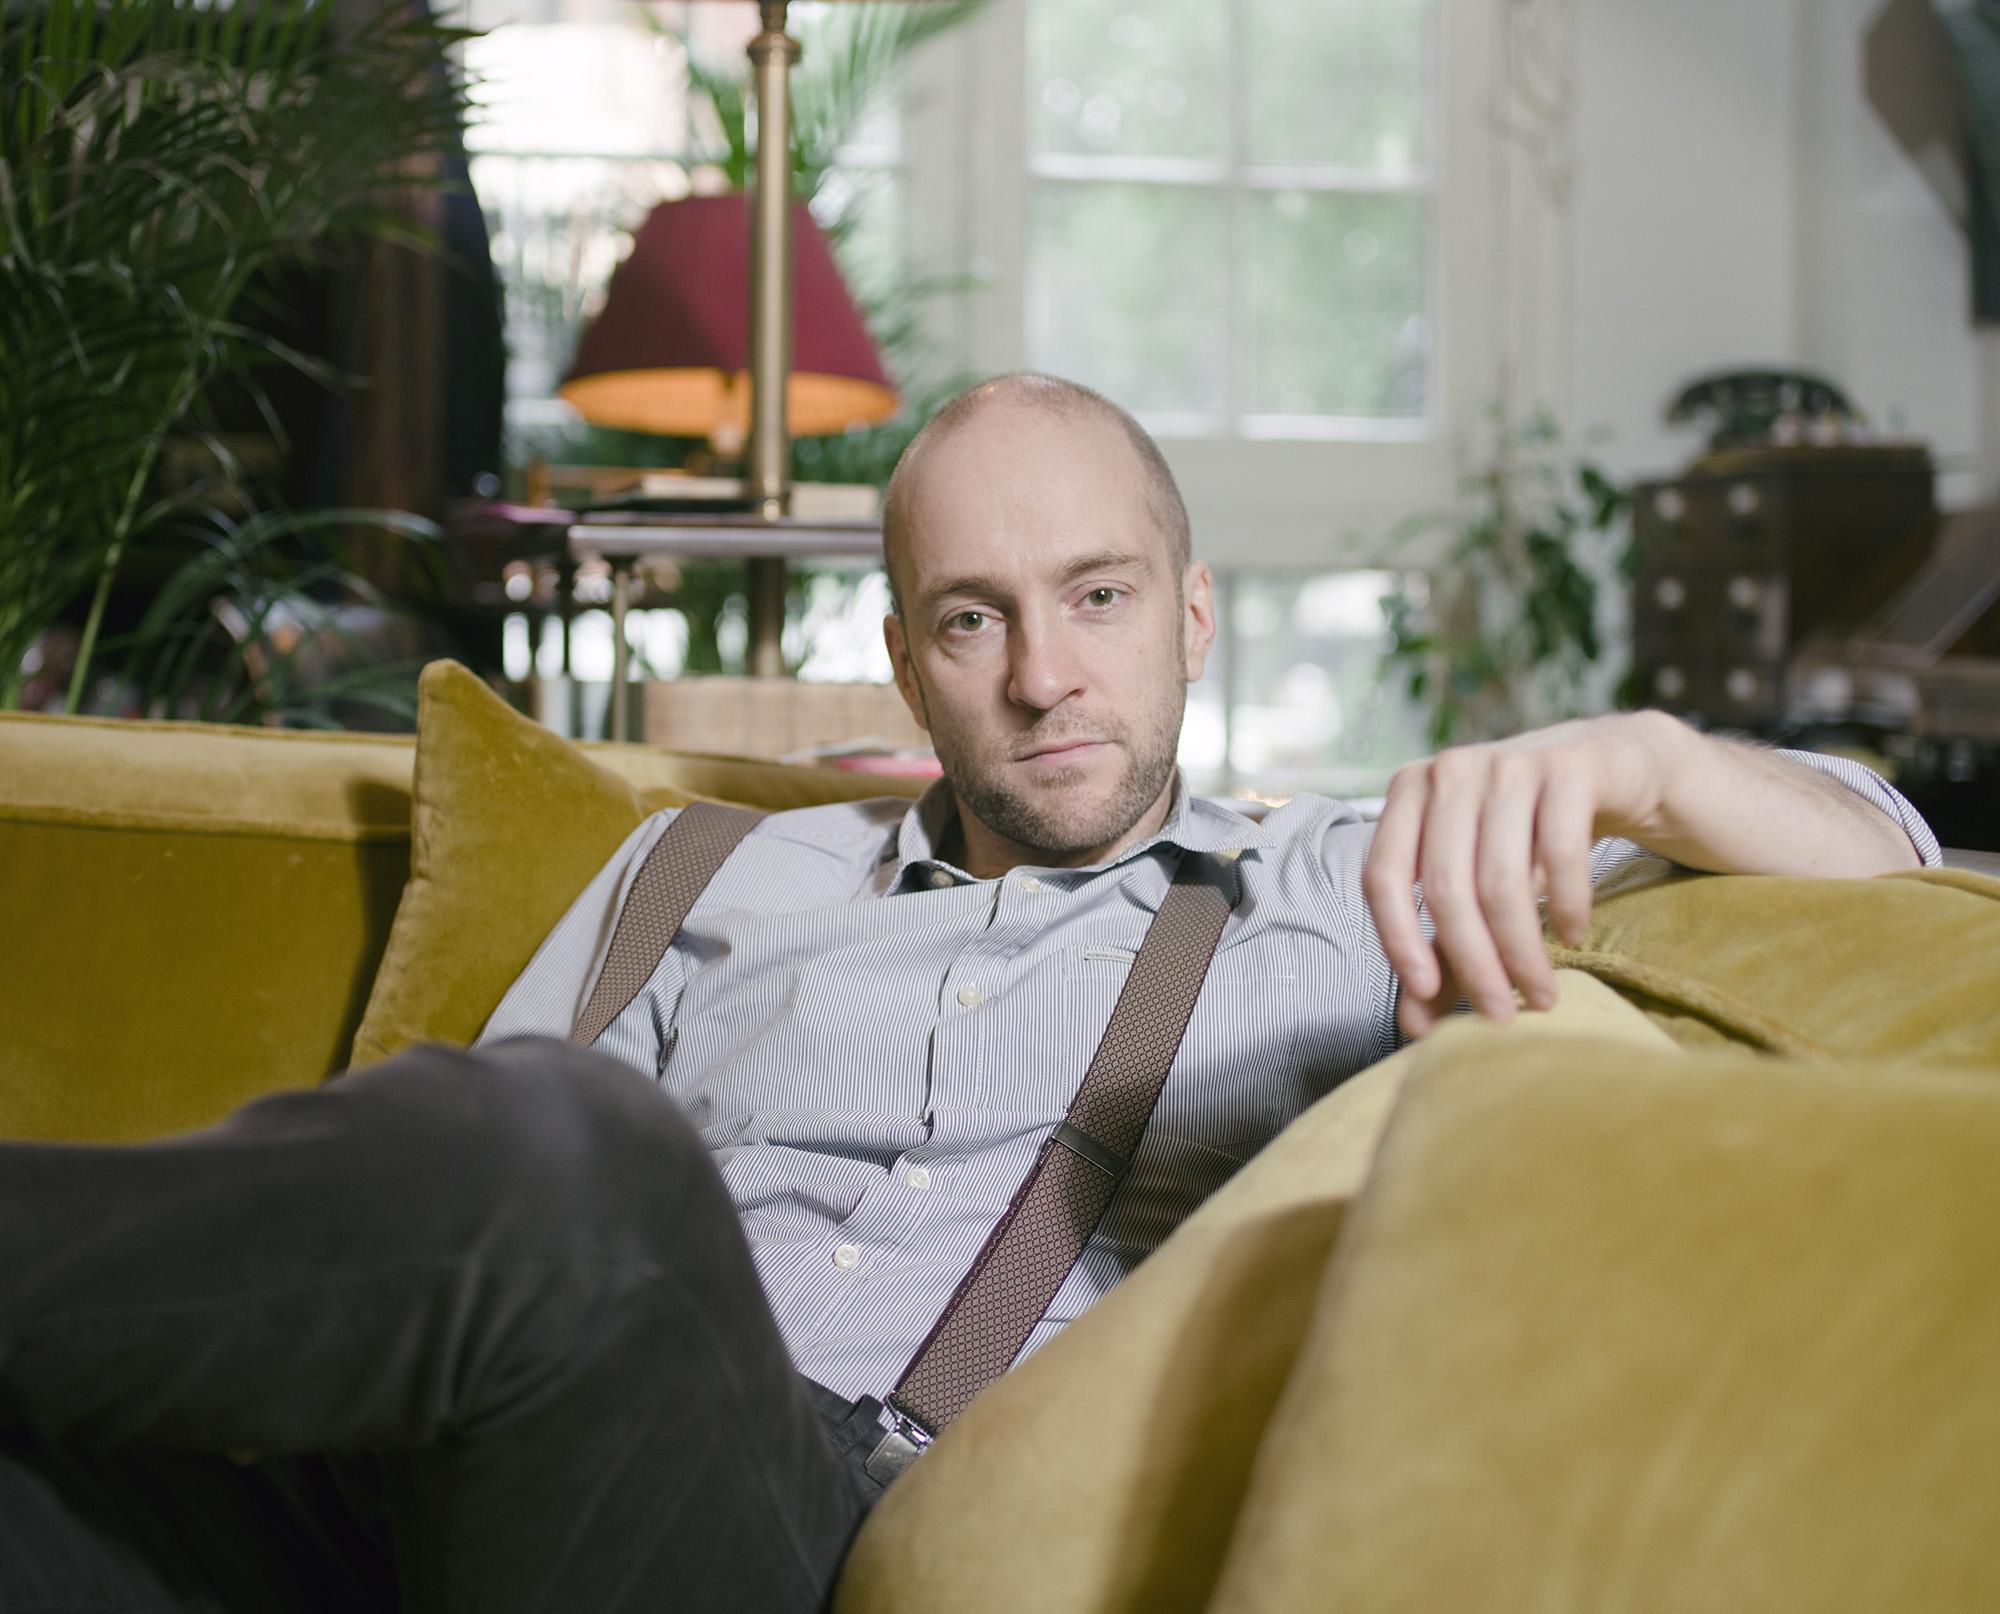 Derren Brown sat on sofa